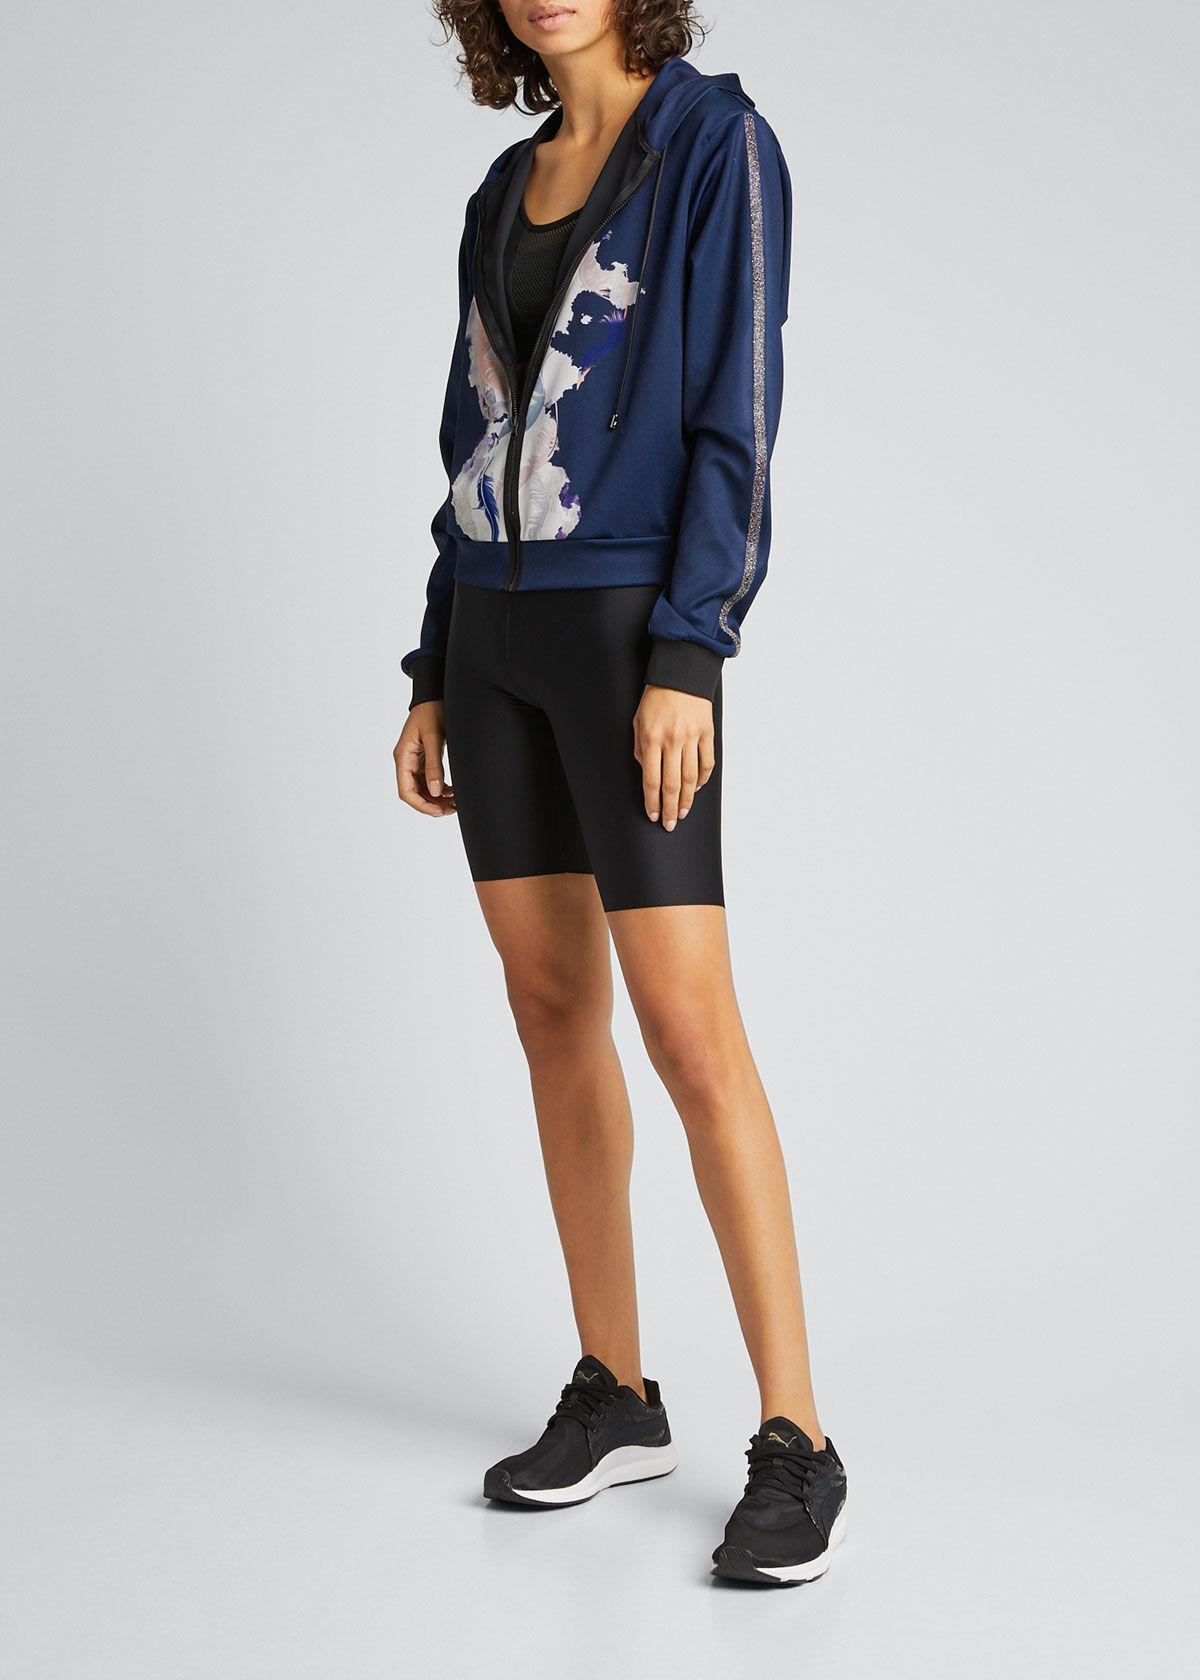 Ultracor Essential Venus Bike Shorts  - female - BLACK - Size: Small